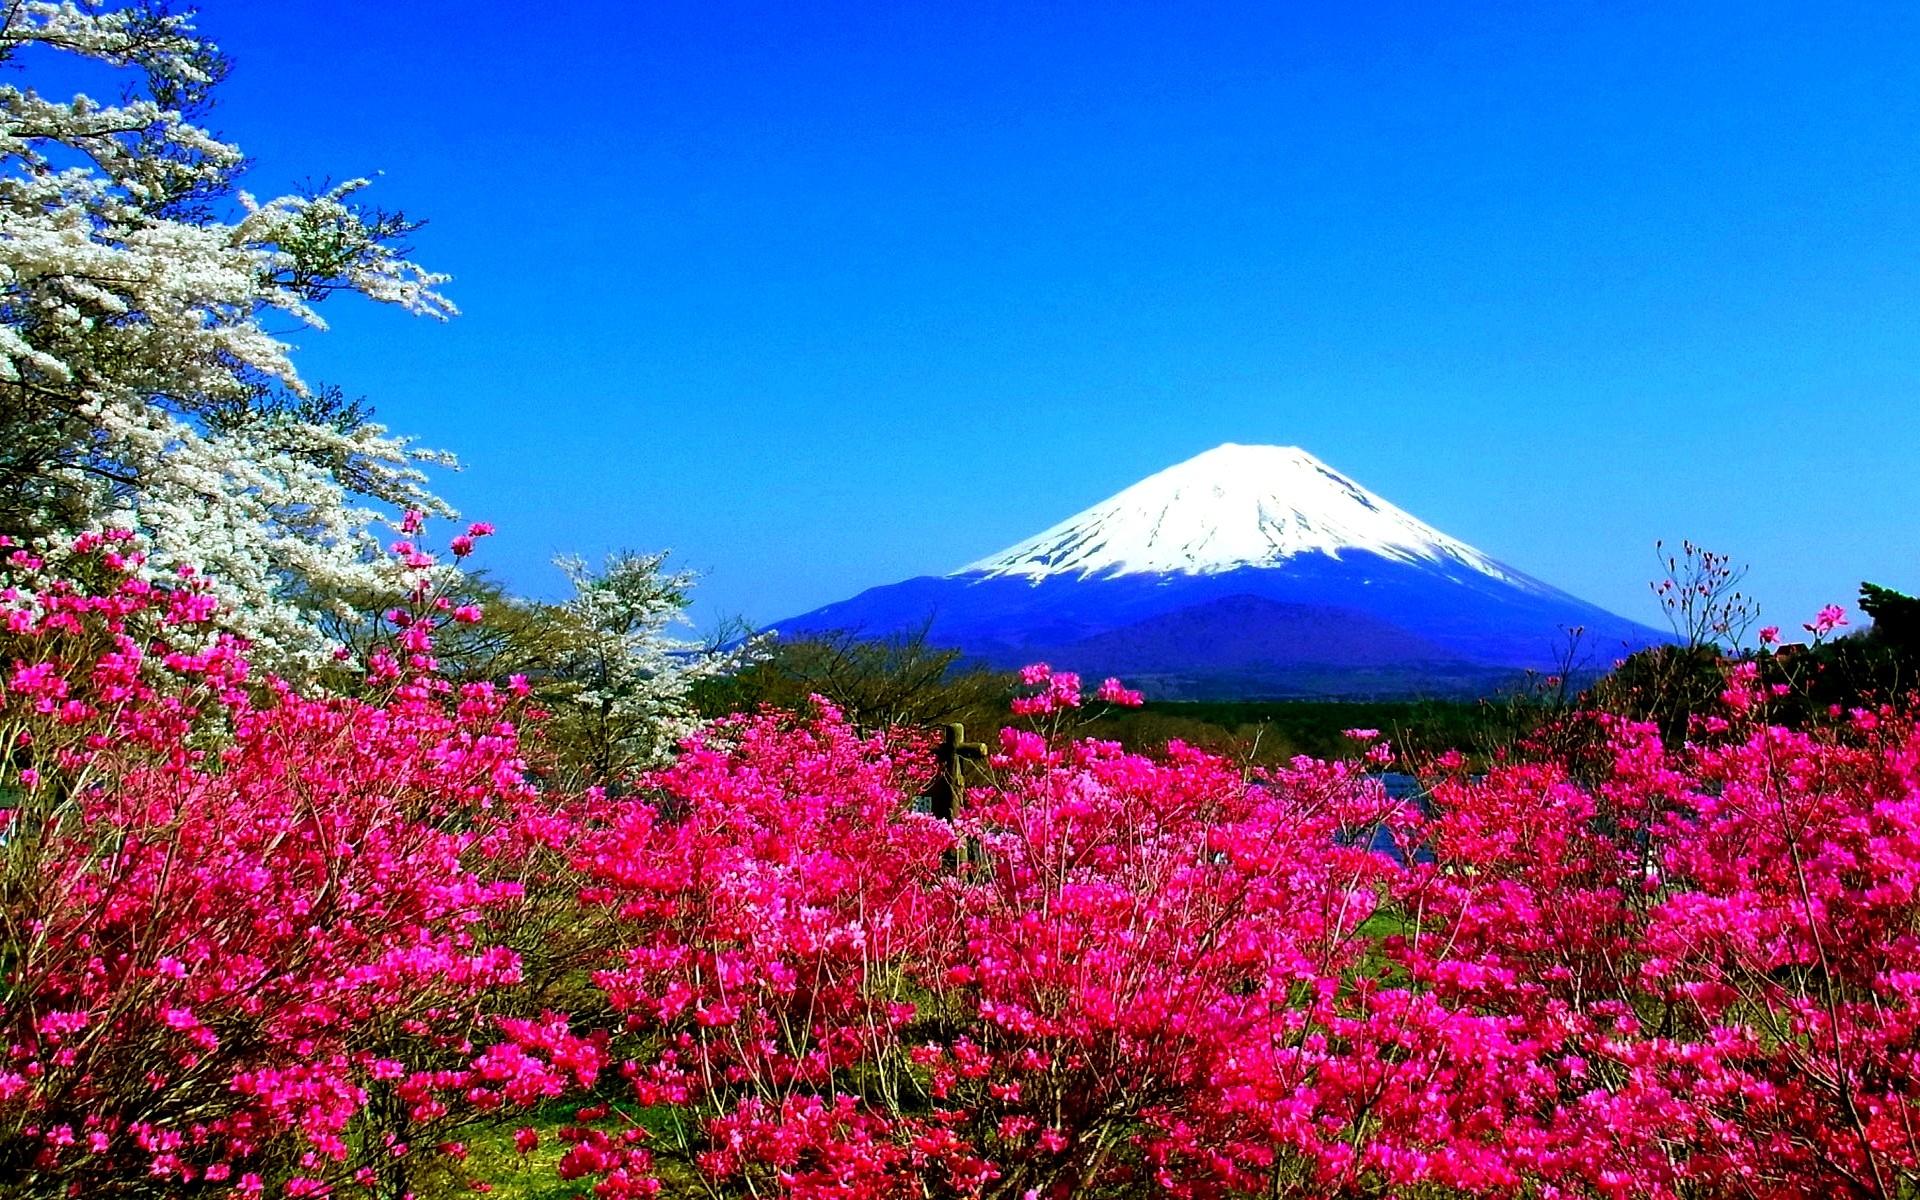 Res: 1920x1200, Spring mountain flowers fuji nature Japan spring hd wallpaper